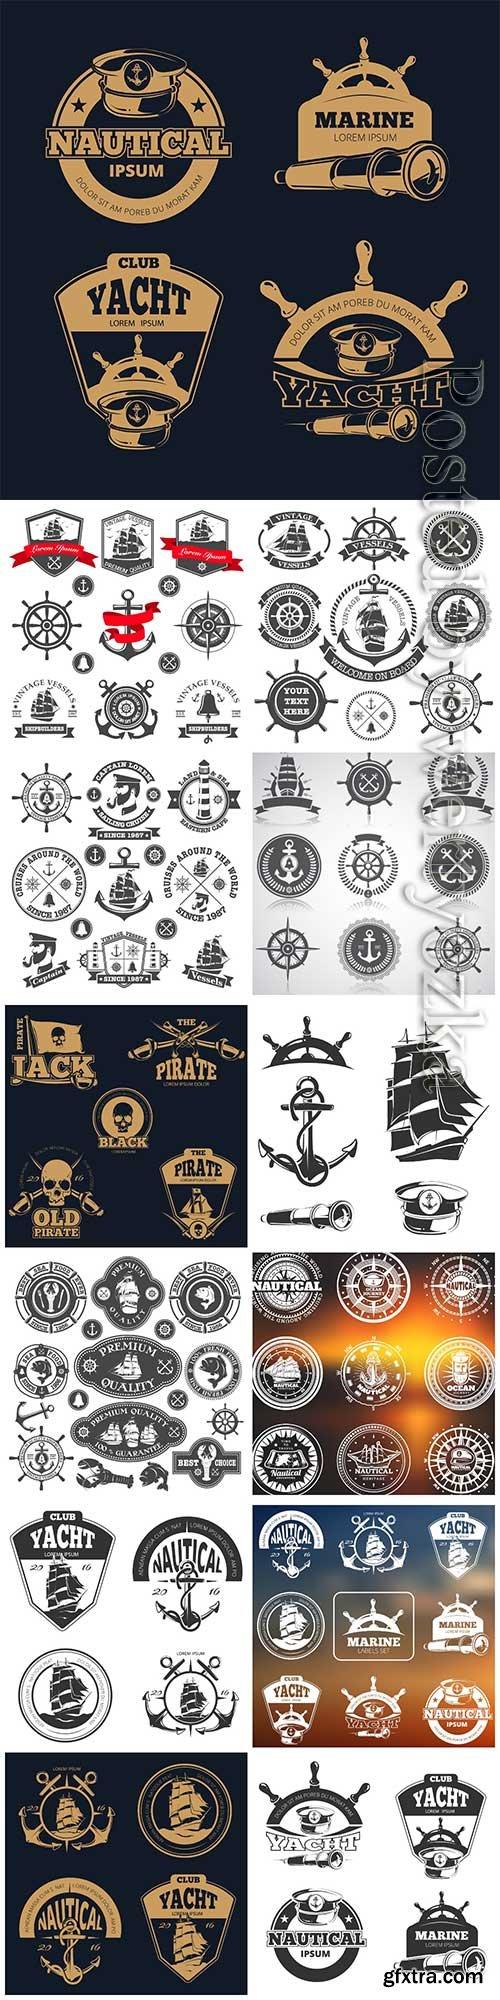 Set of nautical emblems, labels and esignaed elements